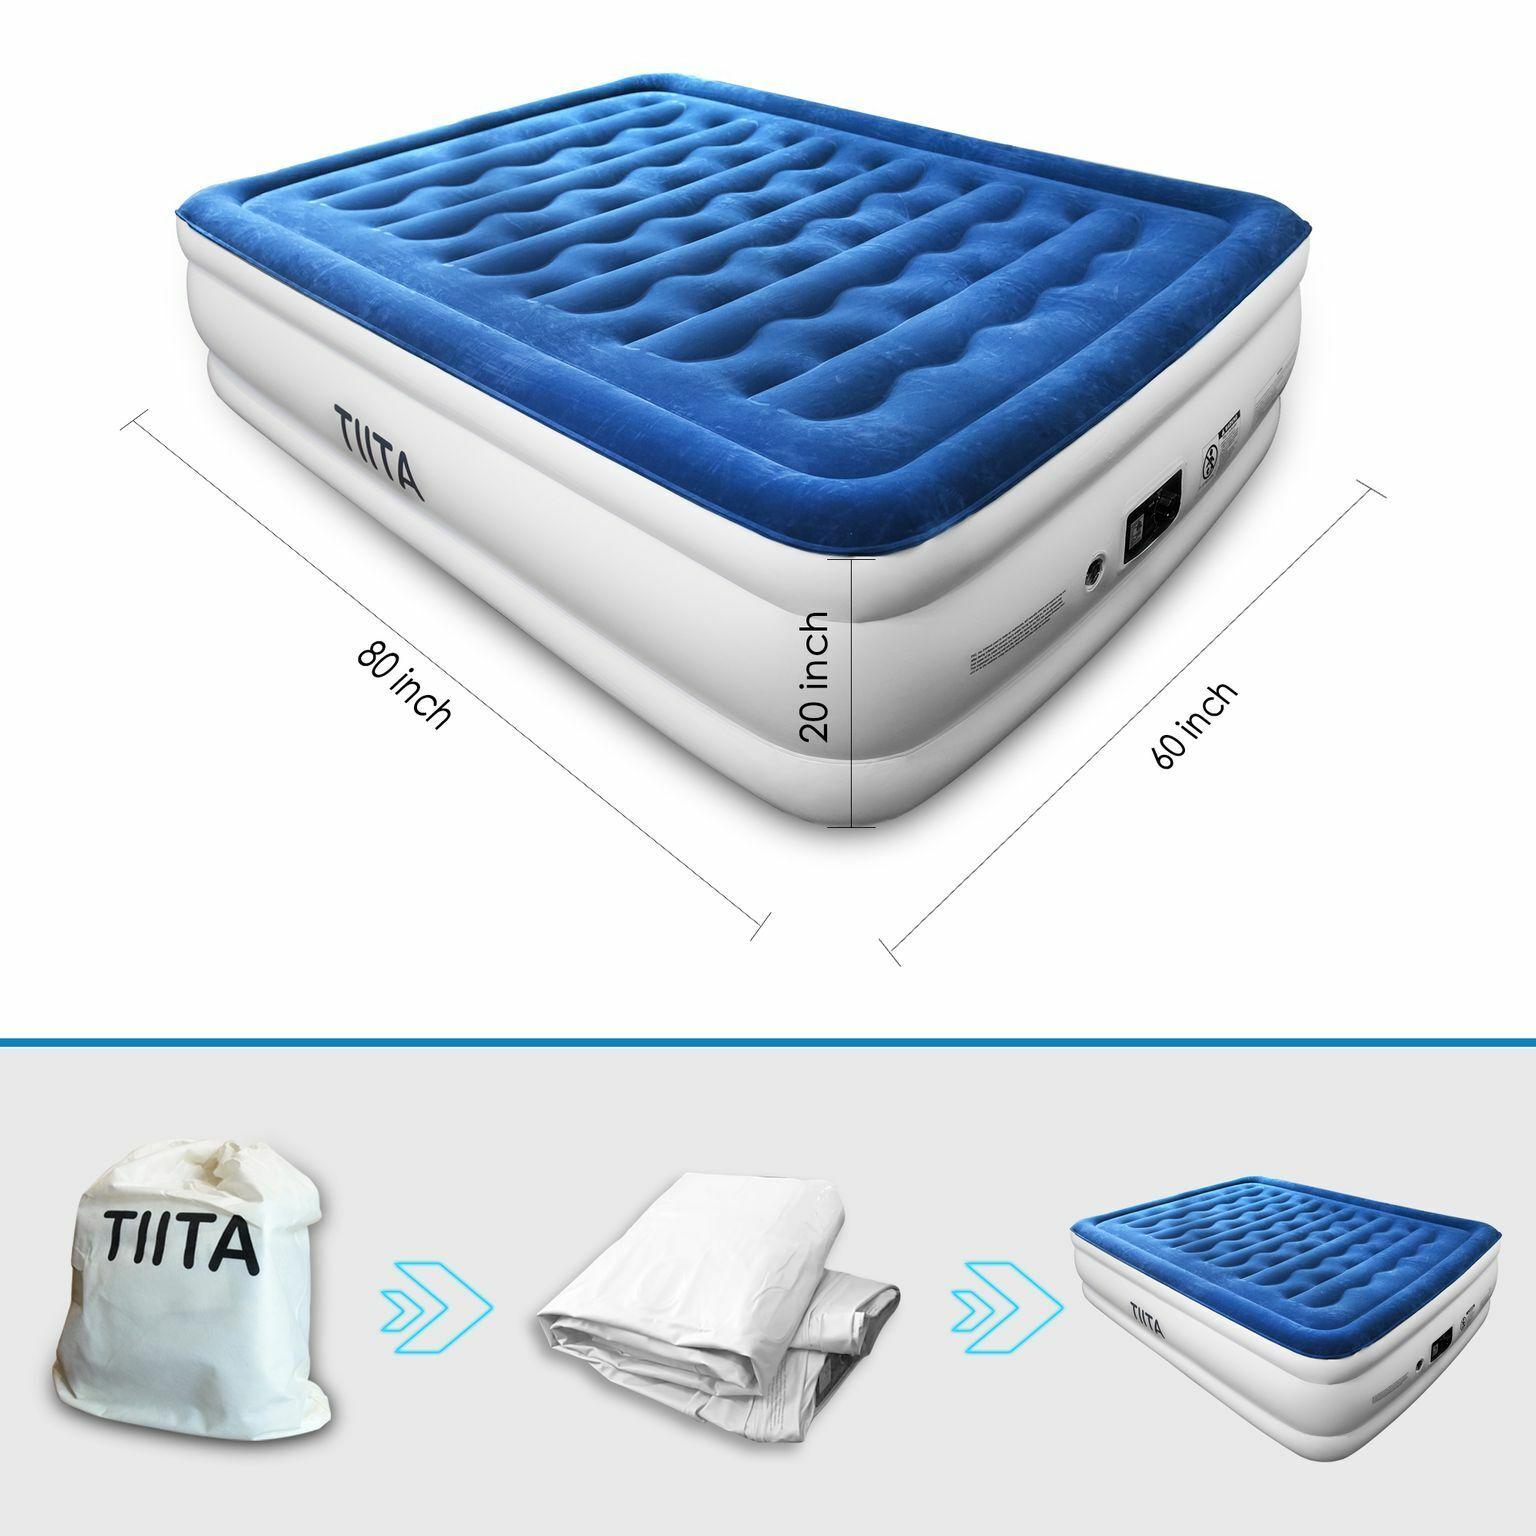 TIITA QUEEN Durable Air Mattress, Built-in Quick Pump, with Storage Bag, 20 in Beds & Mattresses